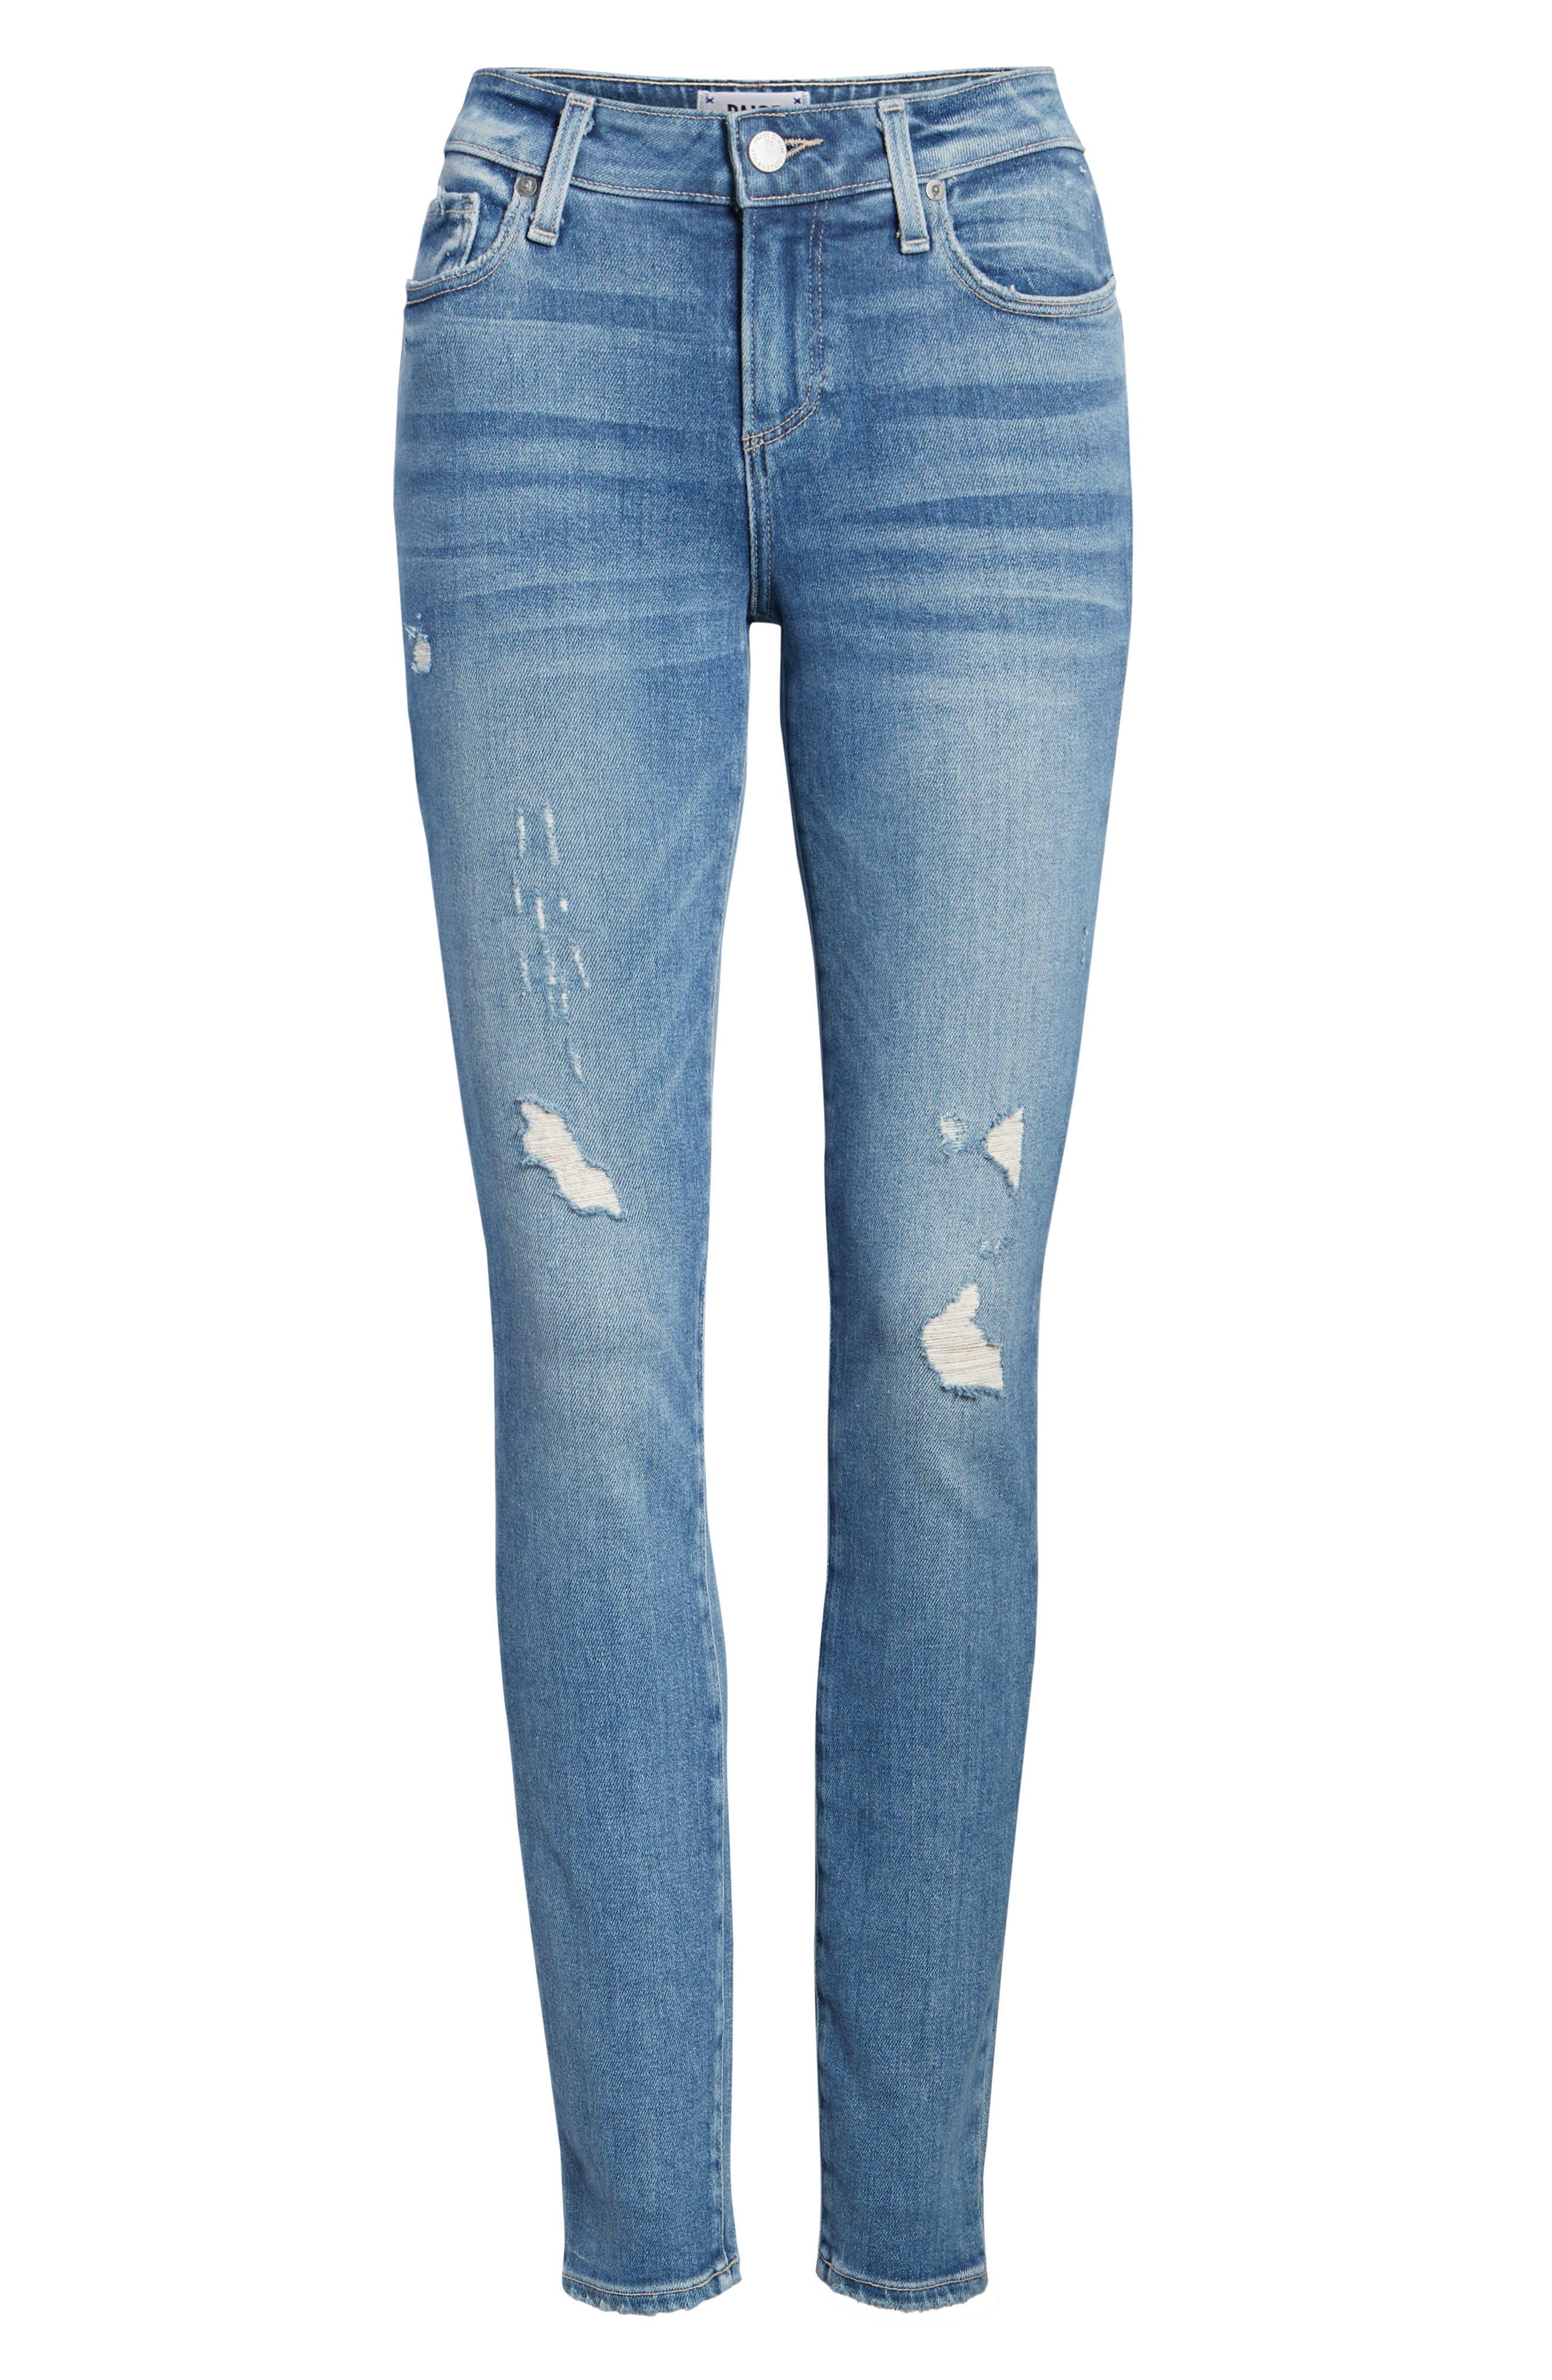 PAIGE,                             Verdugo Ultra Skinny Jeans,                             Alternate thumbnail 7, color,                             KAYSON DISTRESSED